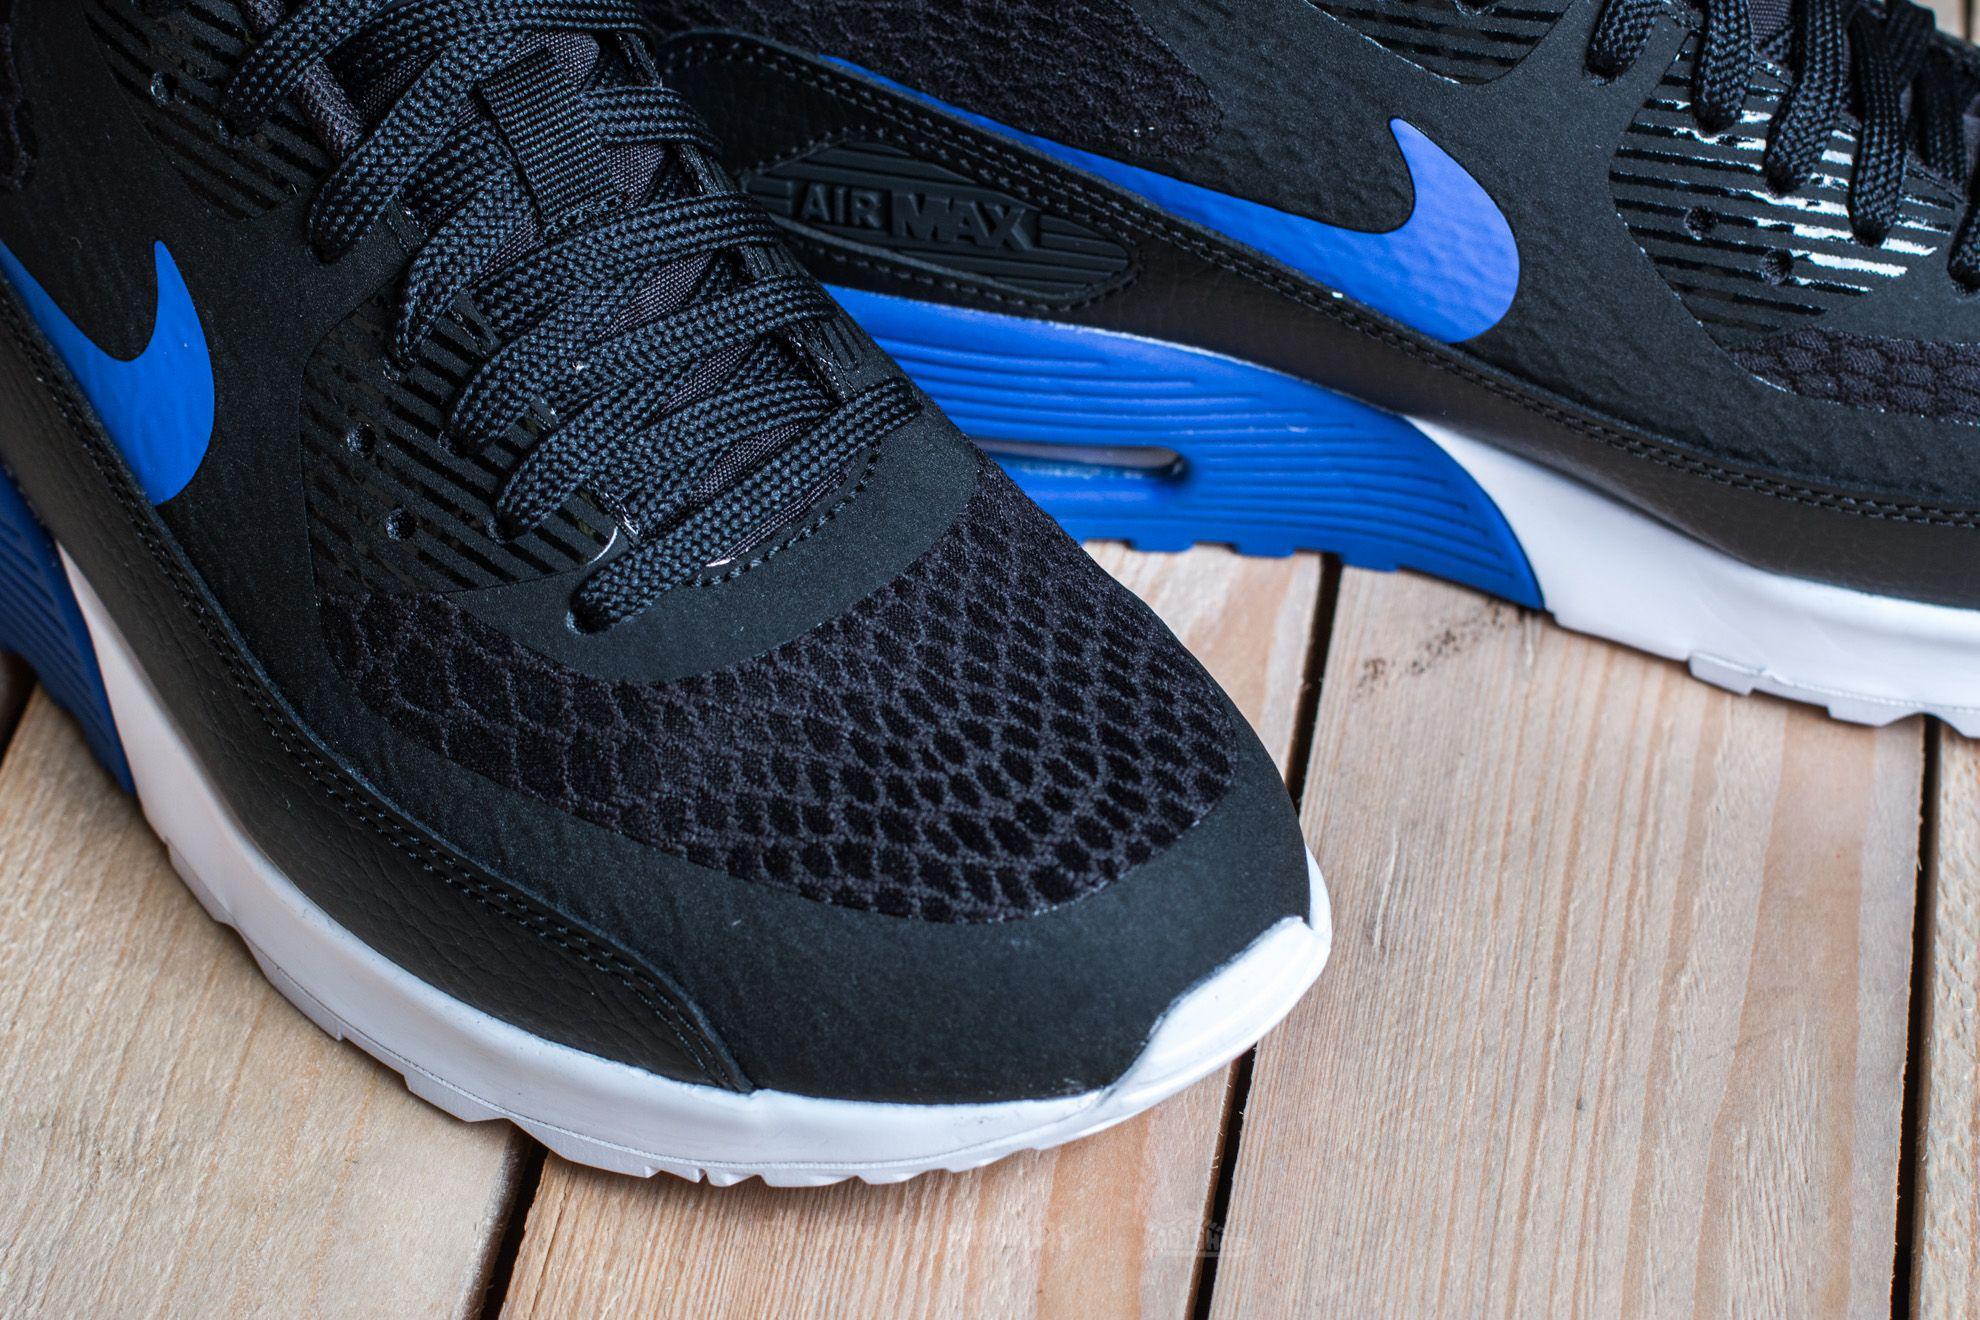 Lyst - Nike W Air Max 90 Ultra 2.0 Black  Paramount Blue-white in ... e154146b122f